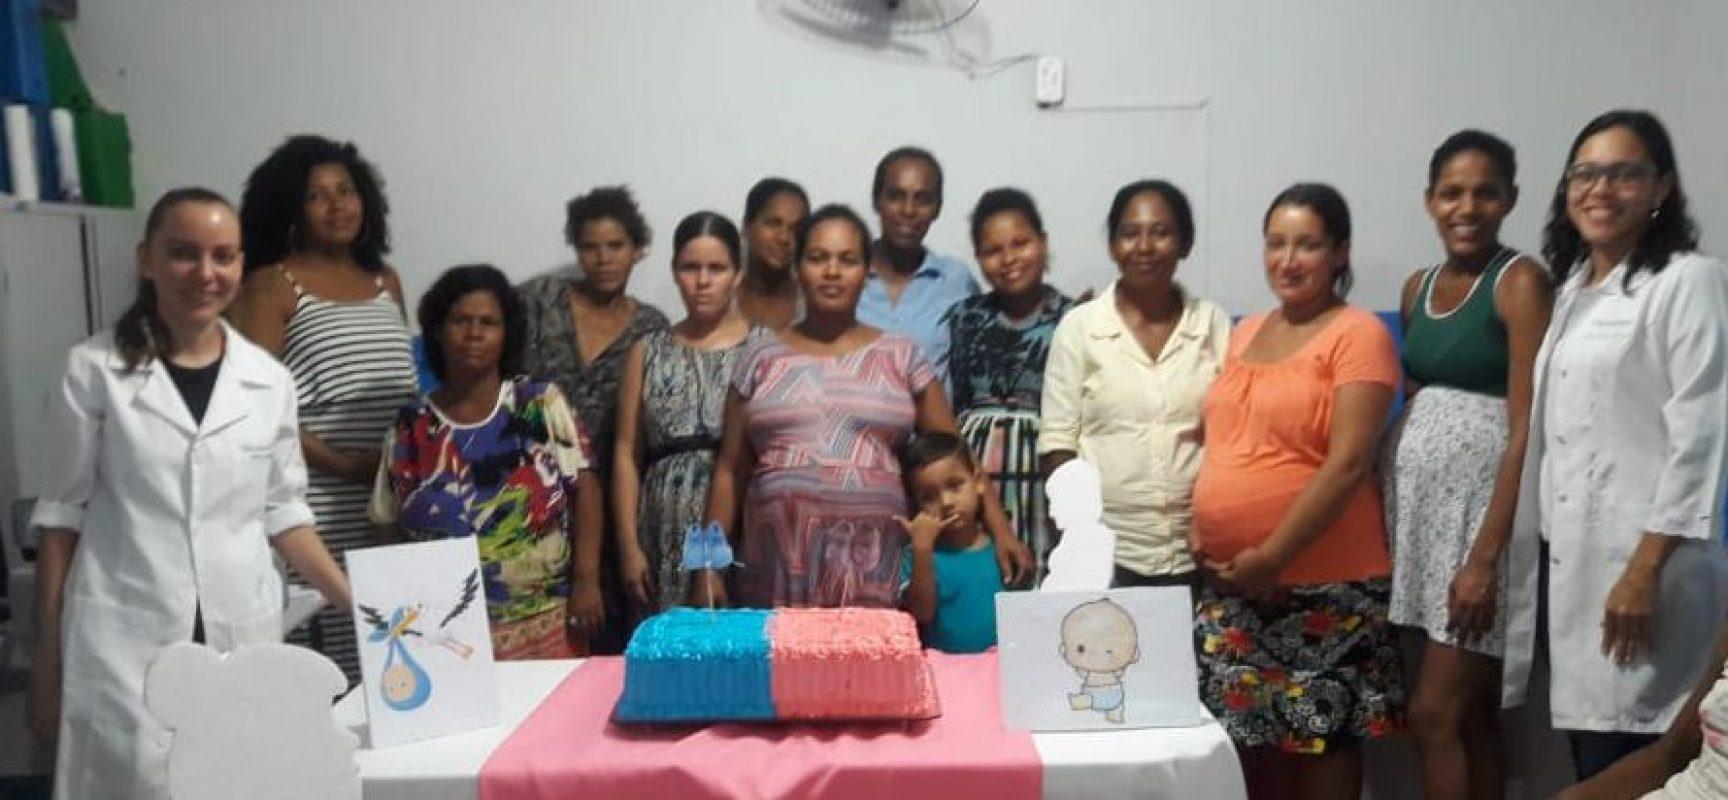 Prefeitura de Una entrega kit maternidade para gestantes atendidas pelos programas sociais